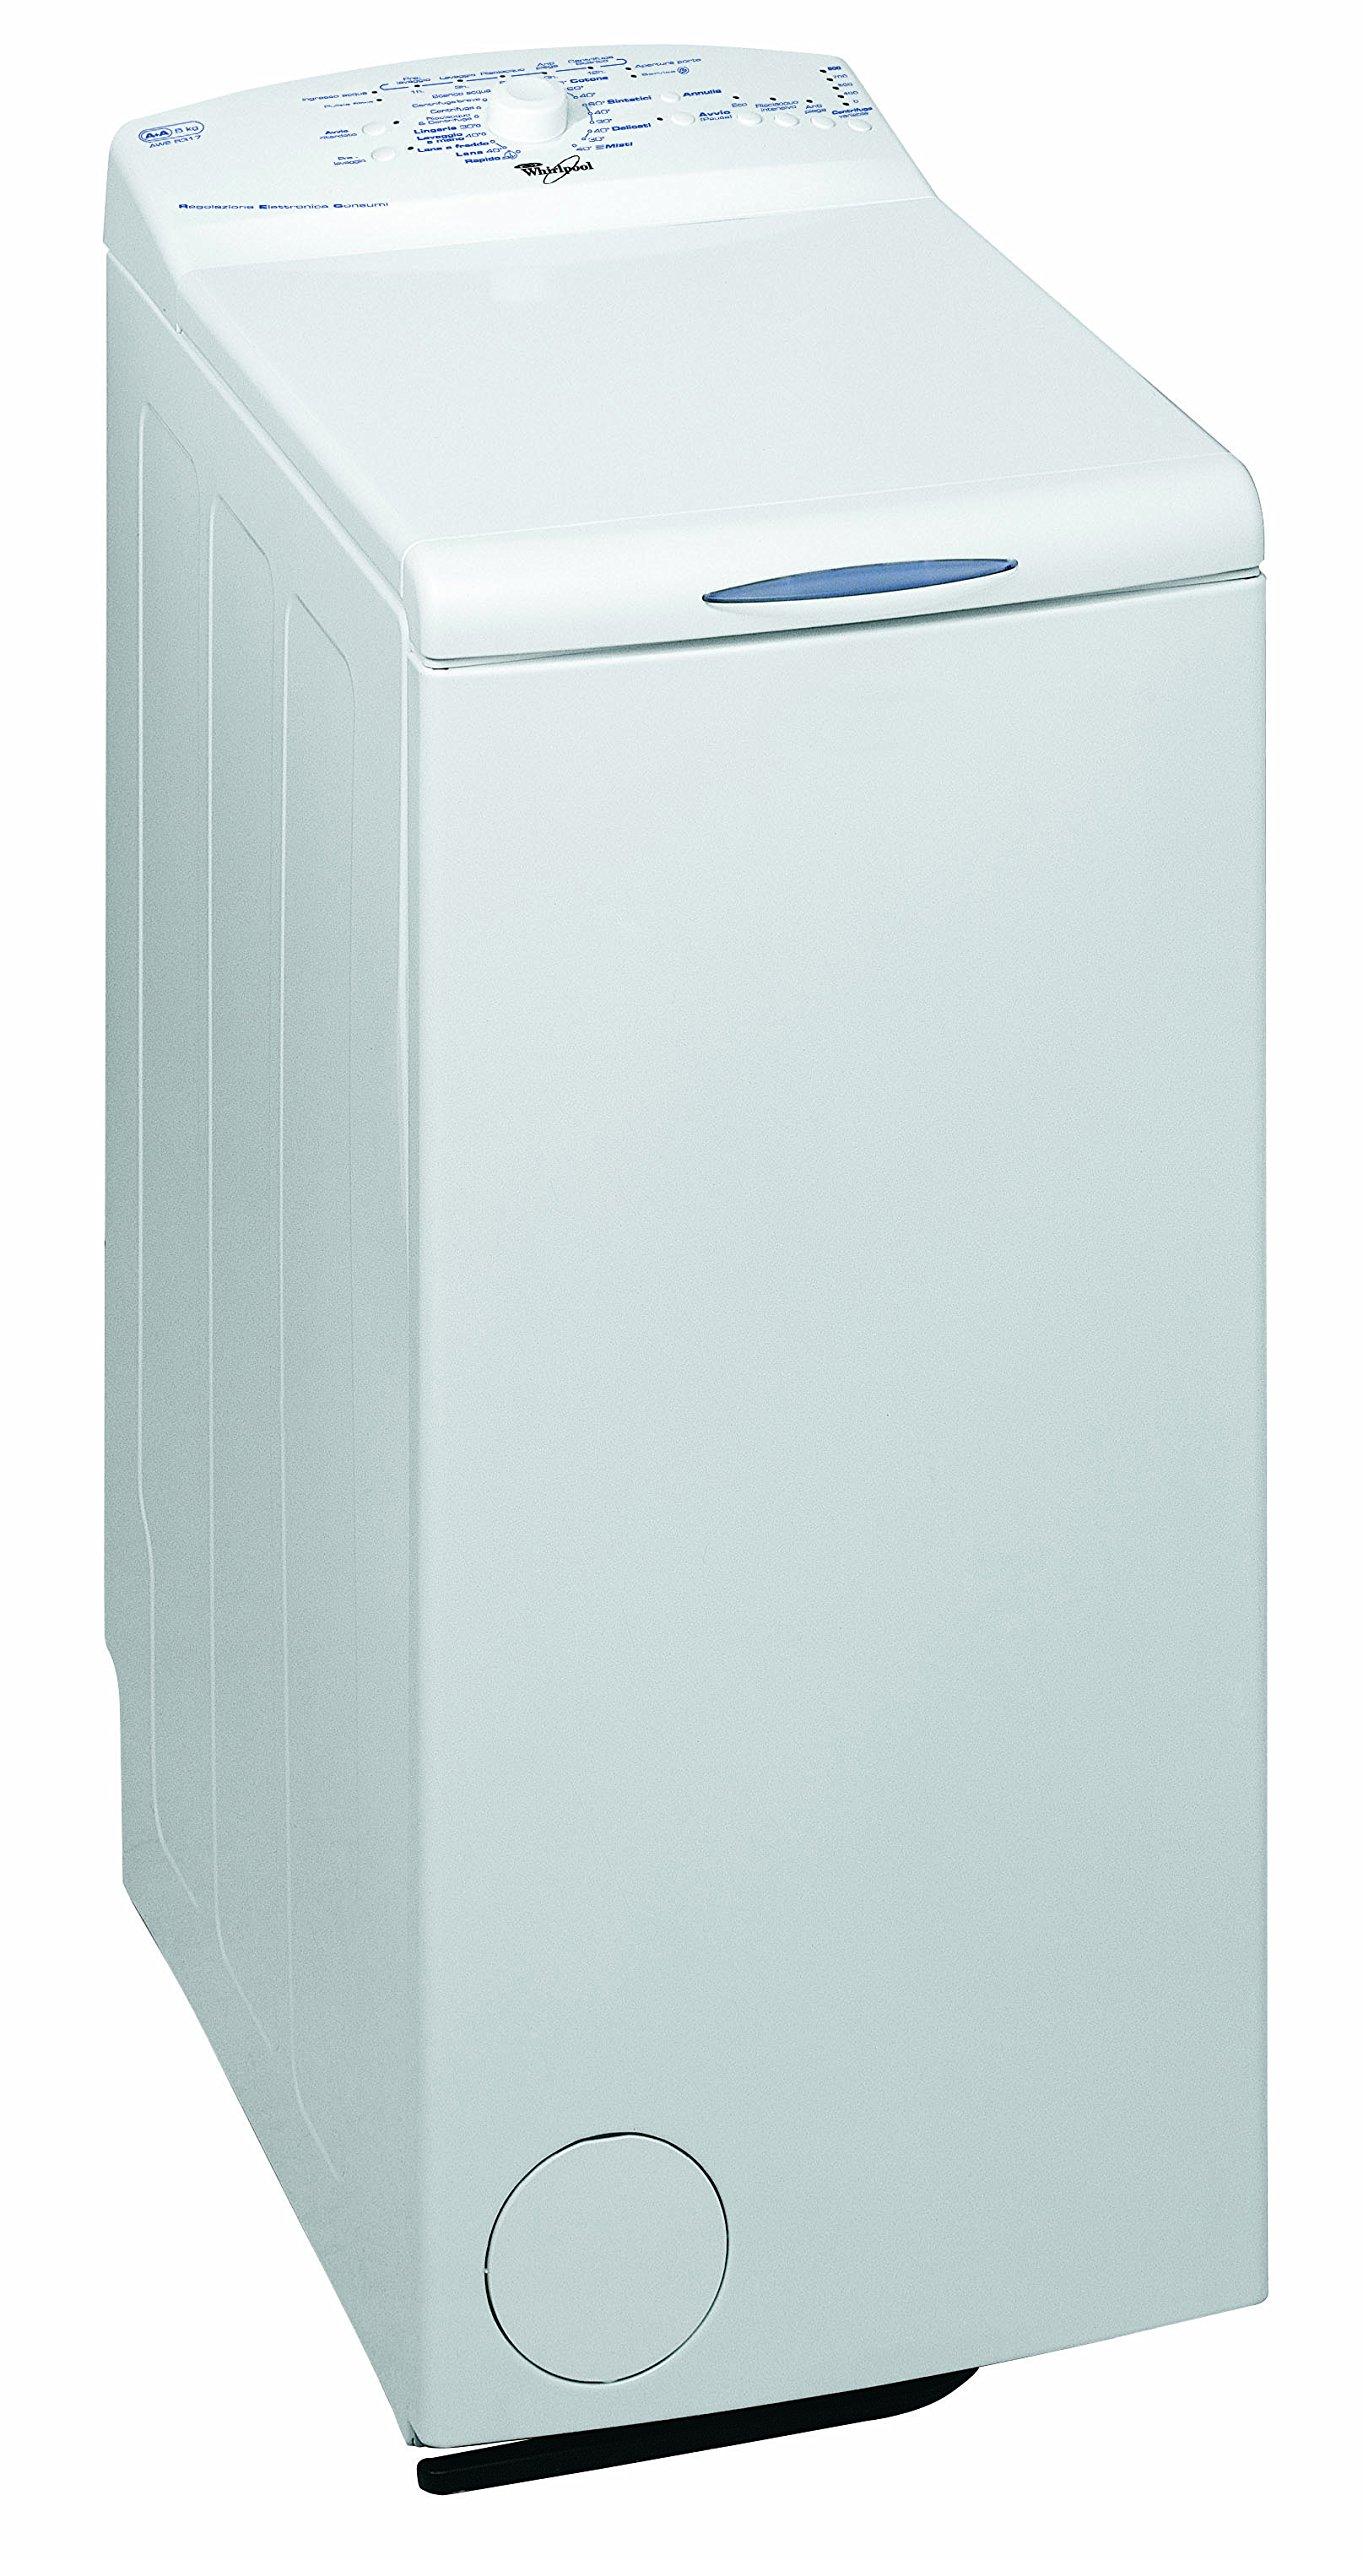 Whirlpool-awe6010-autonome-Ladekabel-Premium-6-kg-1000trmin-A-wei-Waschmaschine–Waschmaschinen-Ladekabel-autonome-Premium-wei-oben-Edelstahl-Wei